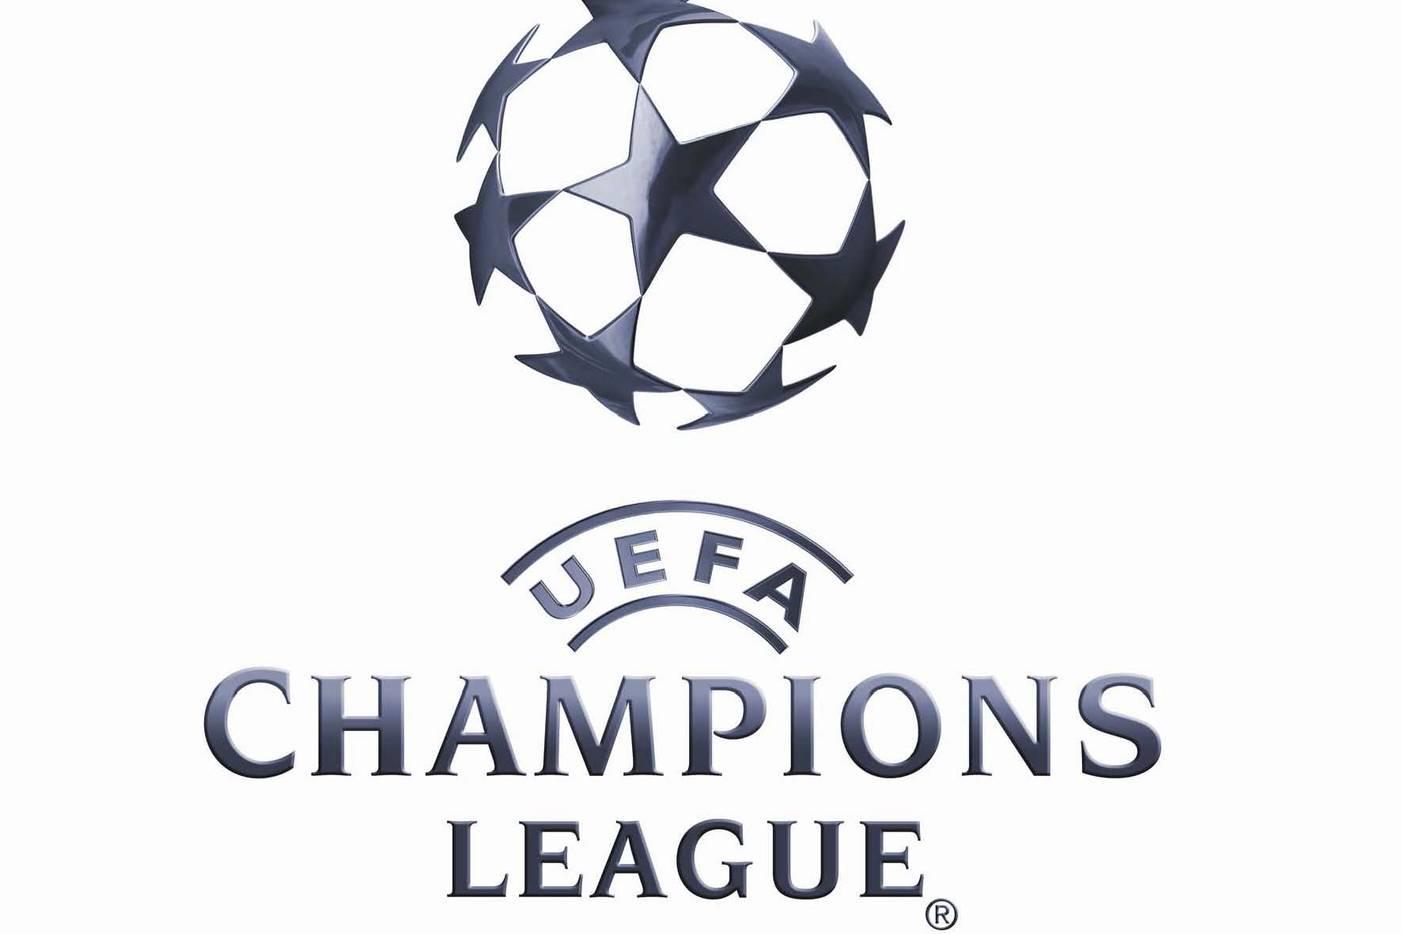 UEFA Champions League (Play4, Play5, Play6, Play7)